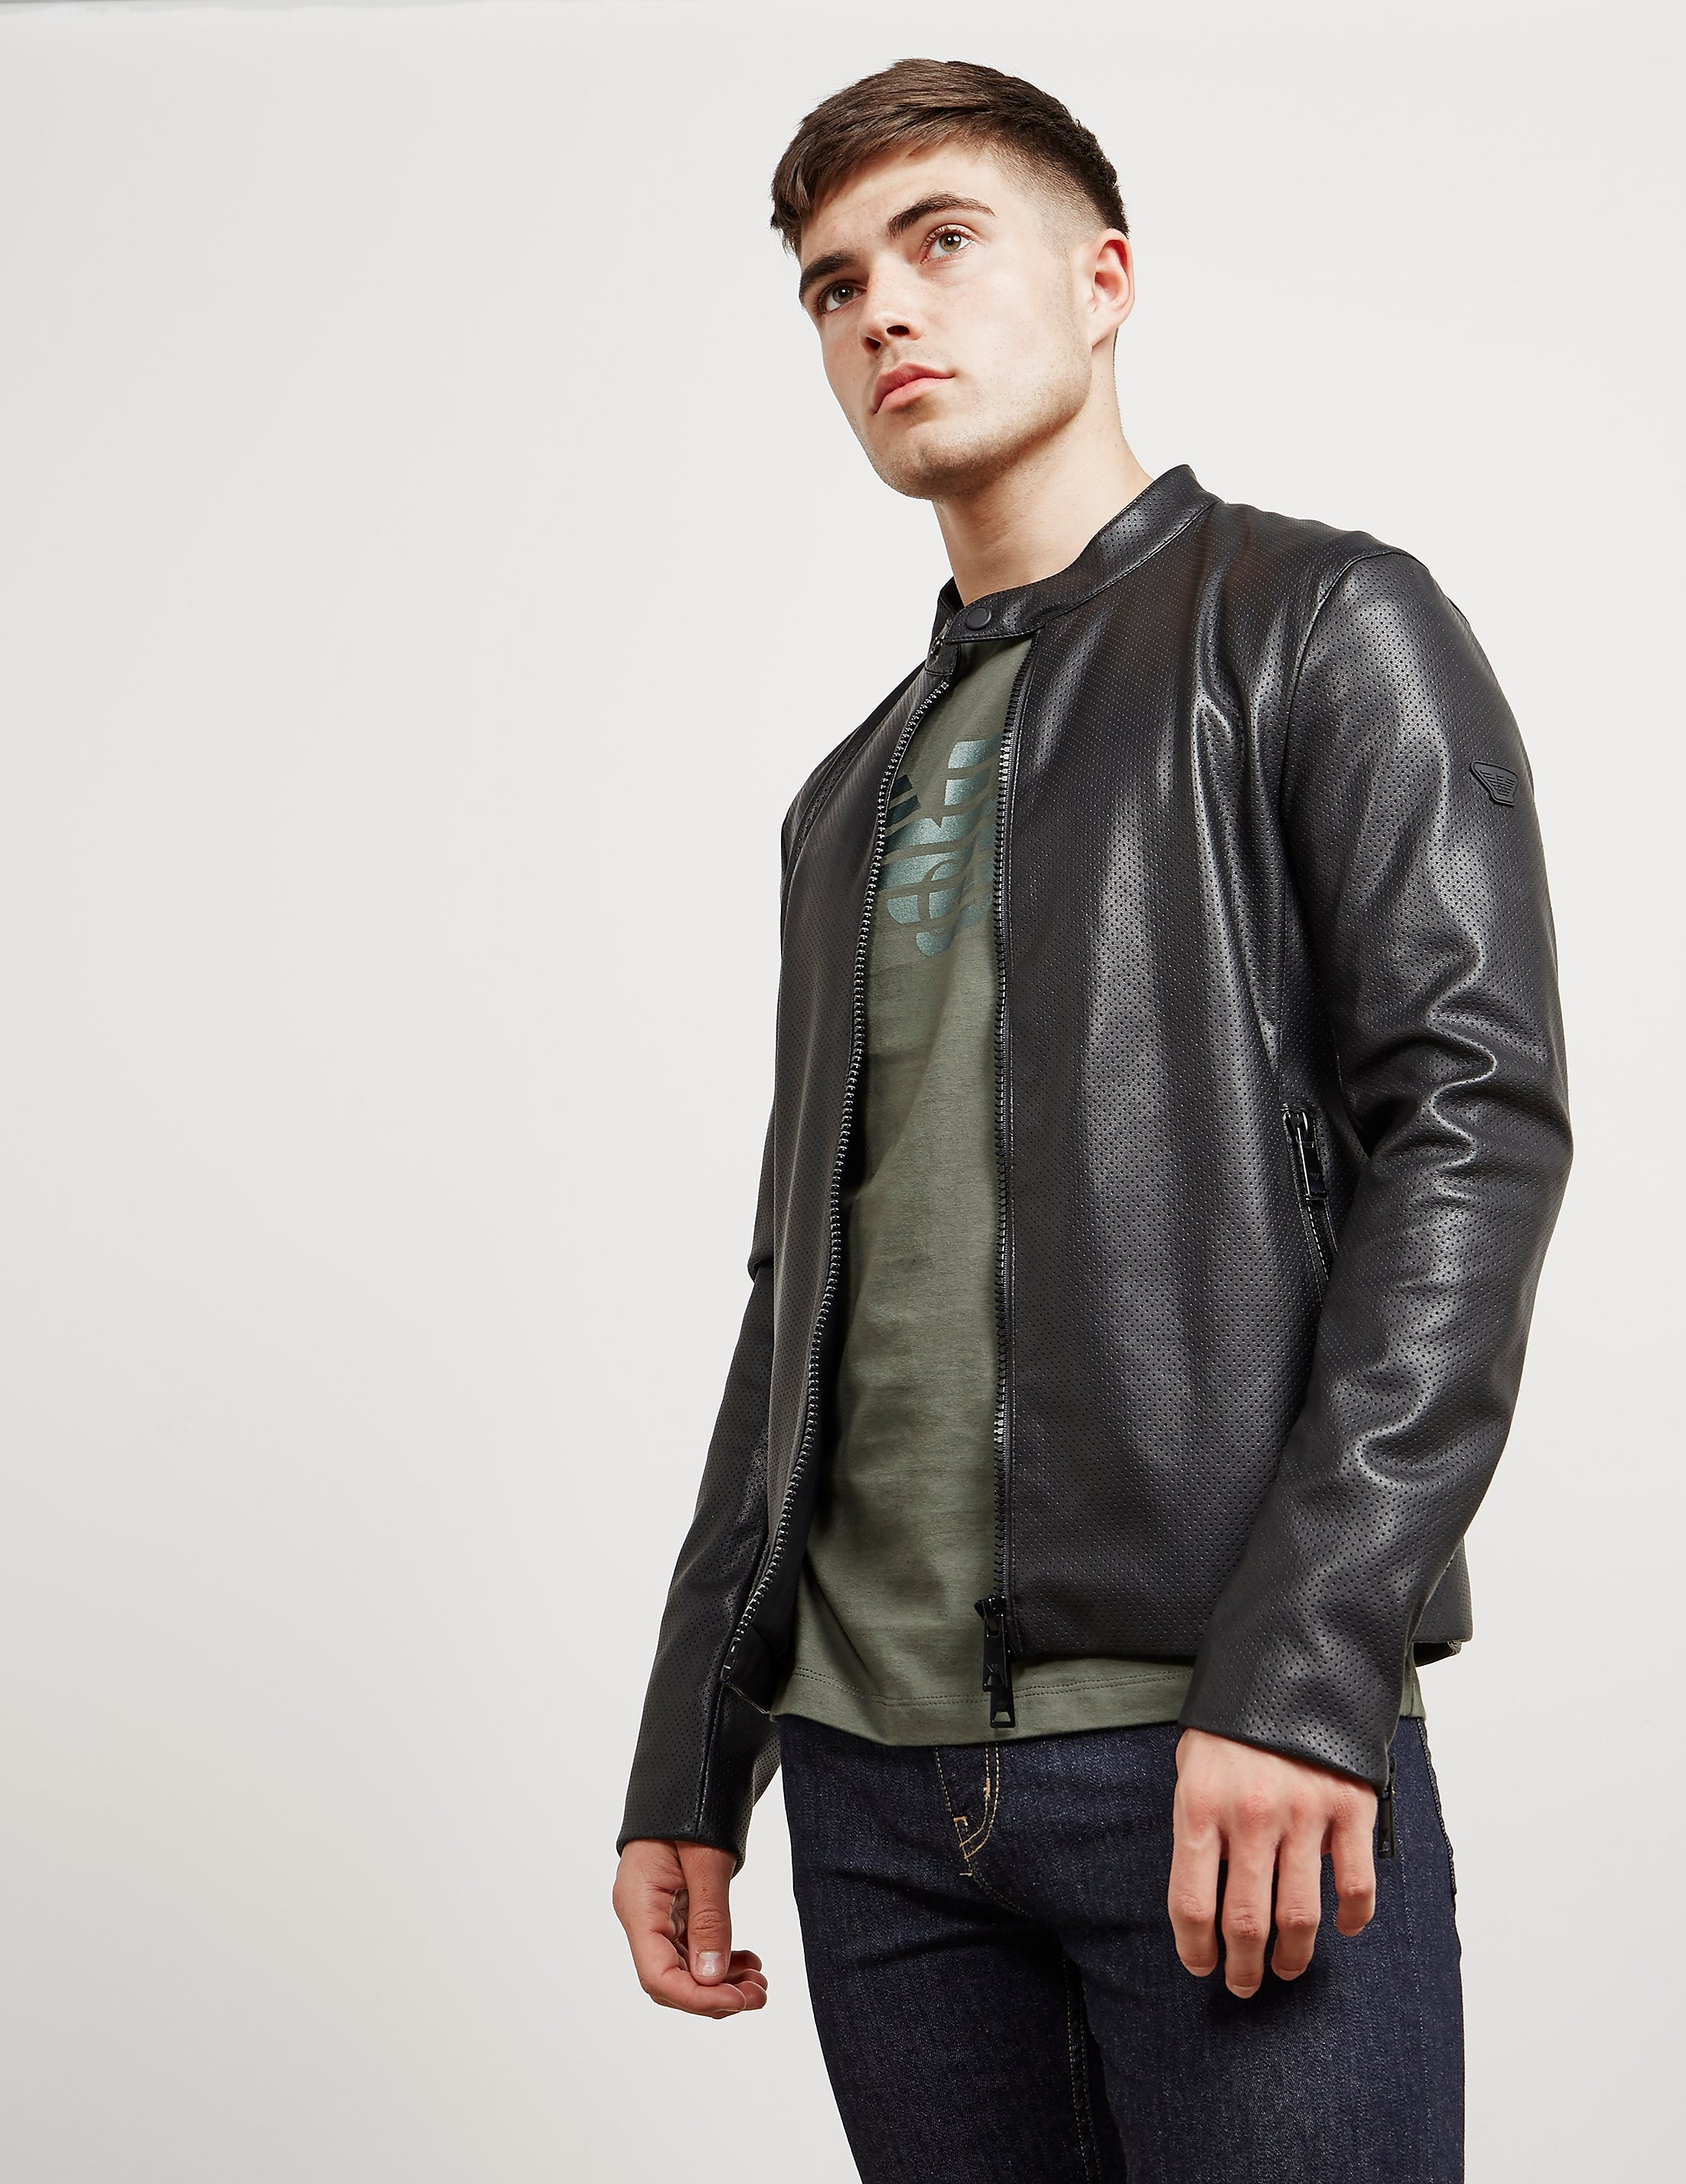 Emporio Armani Eco Leather Bomber Jacket